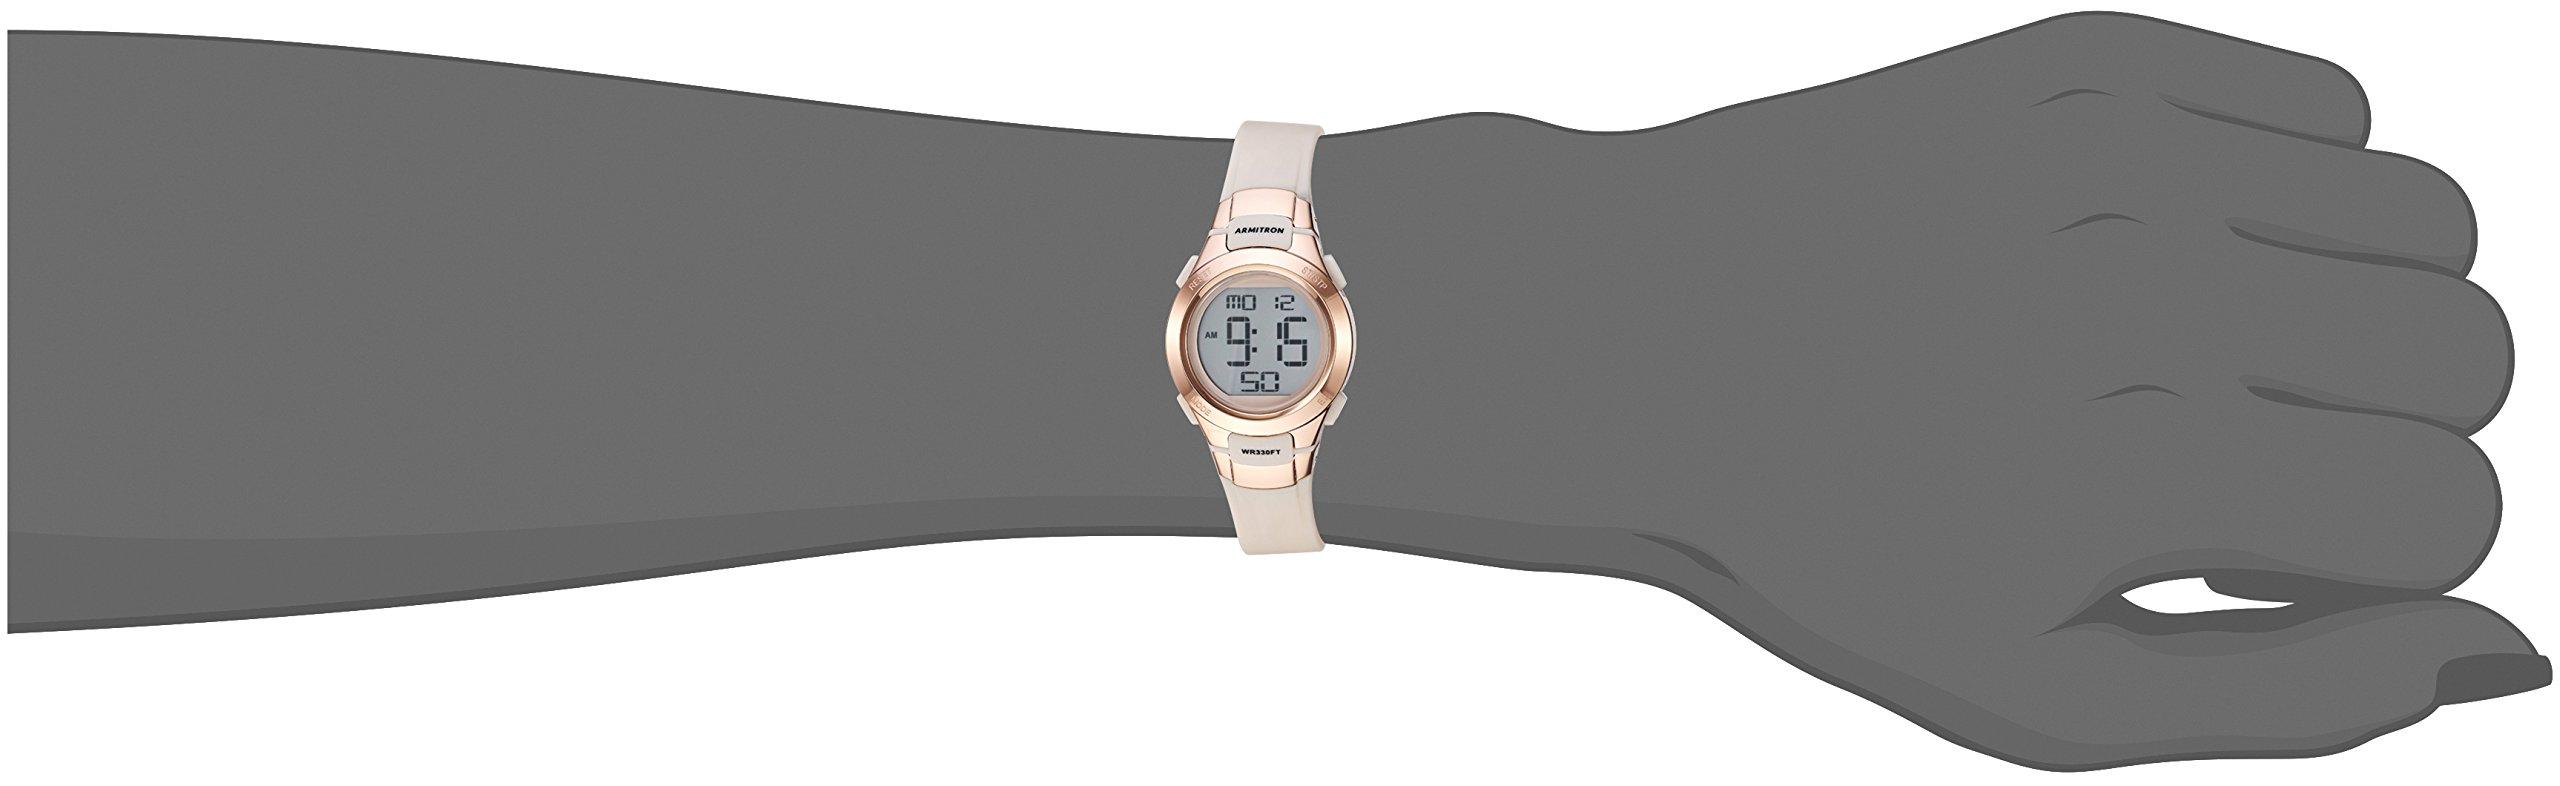 Armitron Sport Women's 45/7012PBH Rose Gold-Tone Accented Digital Chronograph Blush Pink Resin Strap Watch by Armitron Sport (Image #2)